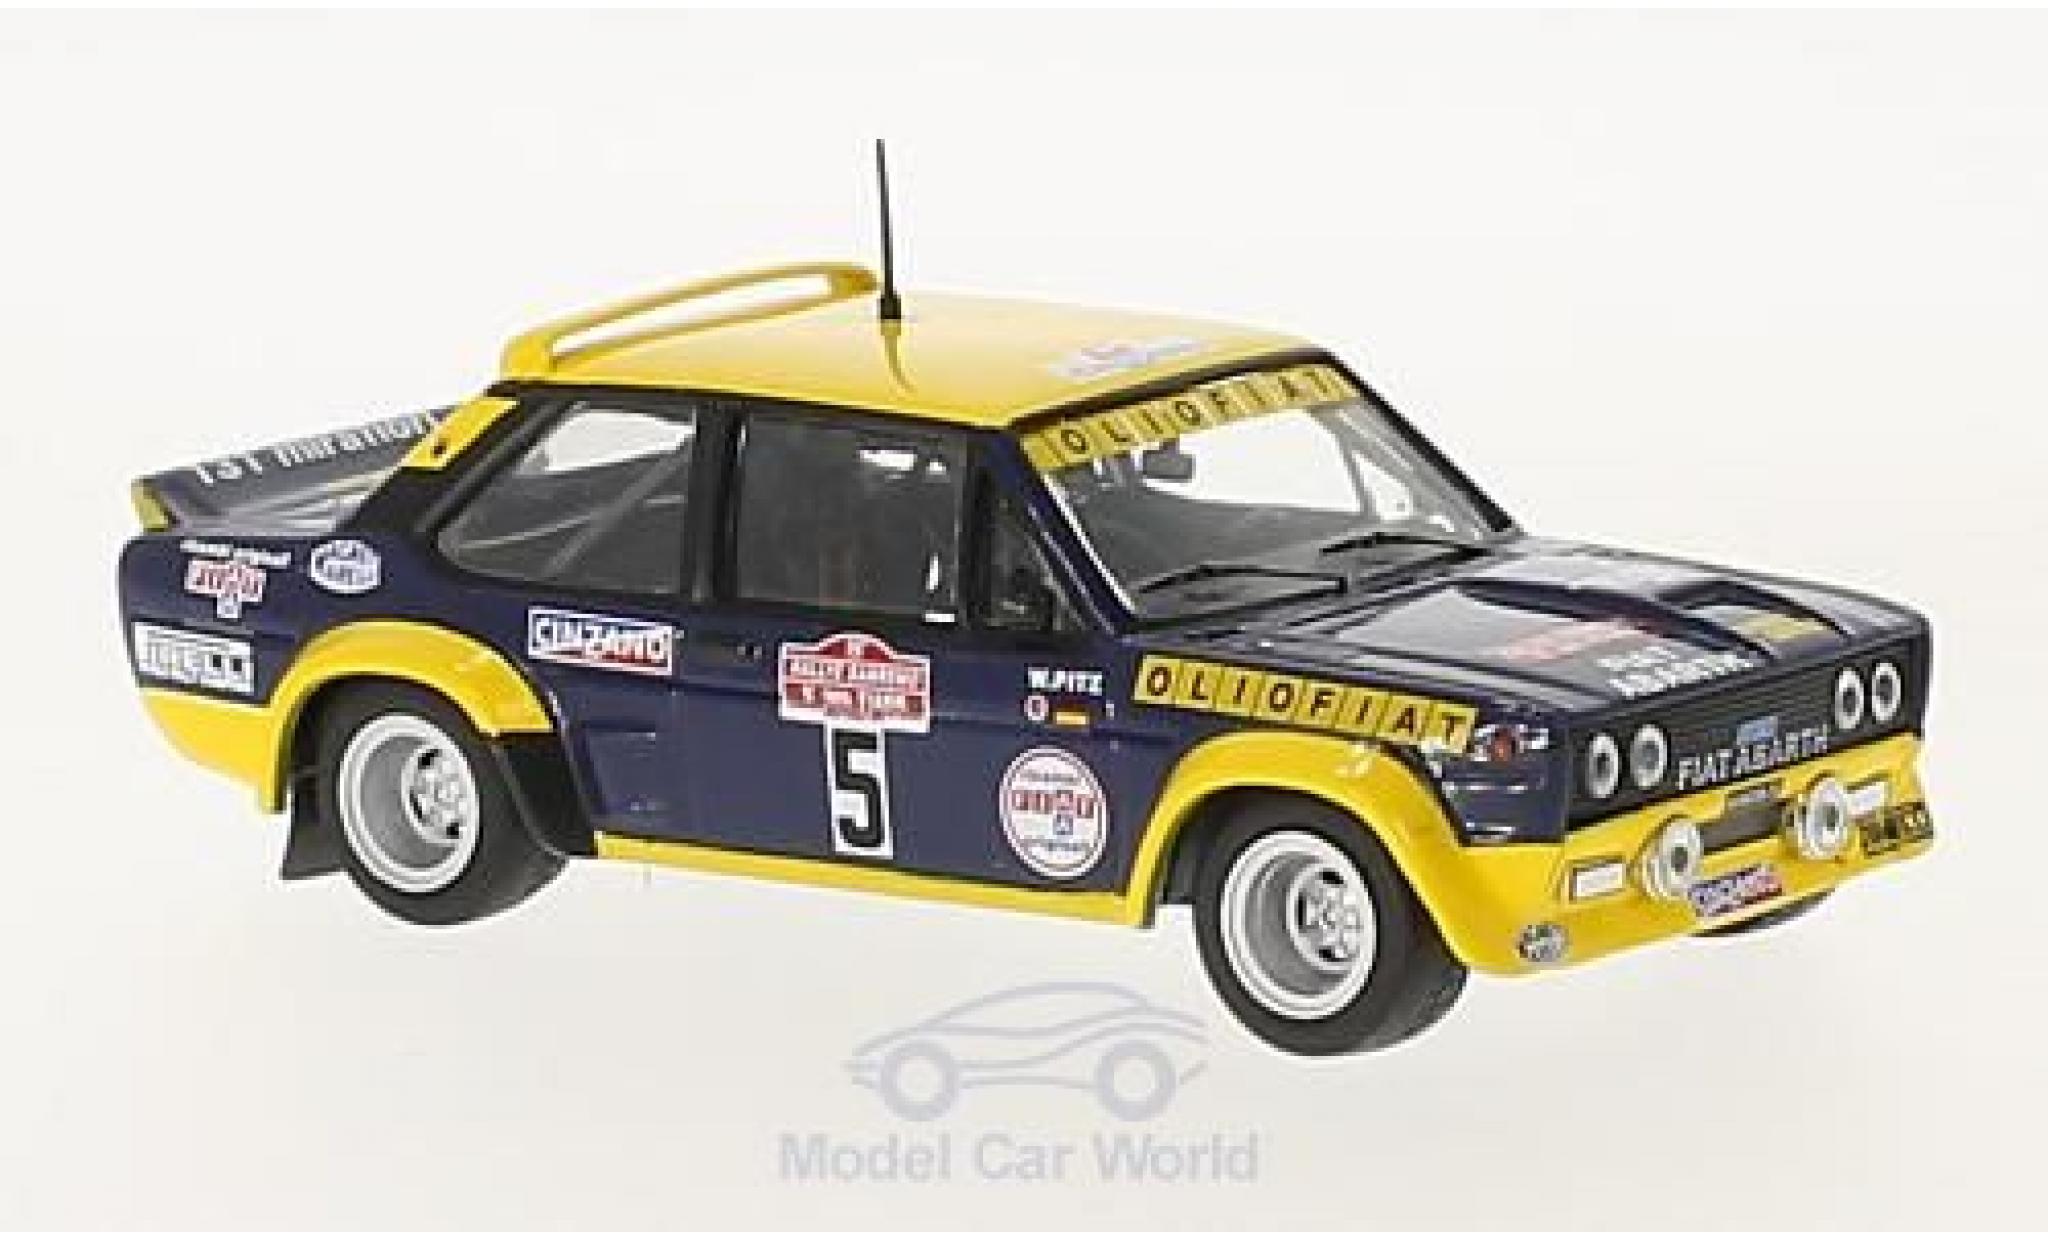 Fiat 131 Abarth 1/43 IXO Abarth No.5 Olio Rallye WM Rally San Remo 1977 W.Röhrl/W.Pitz